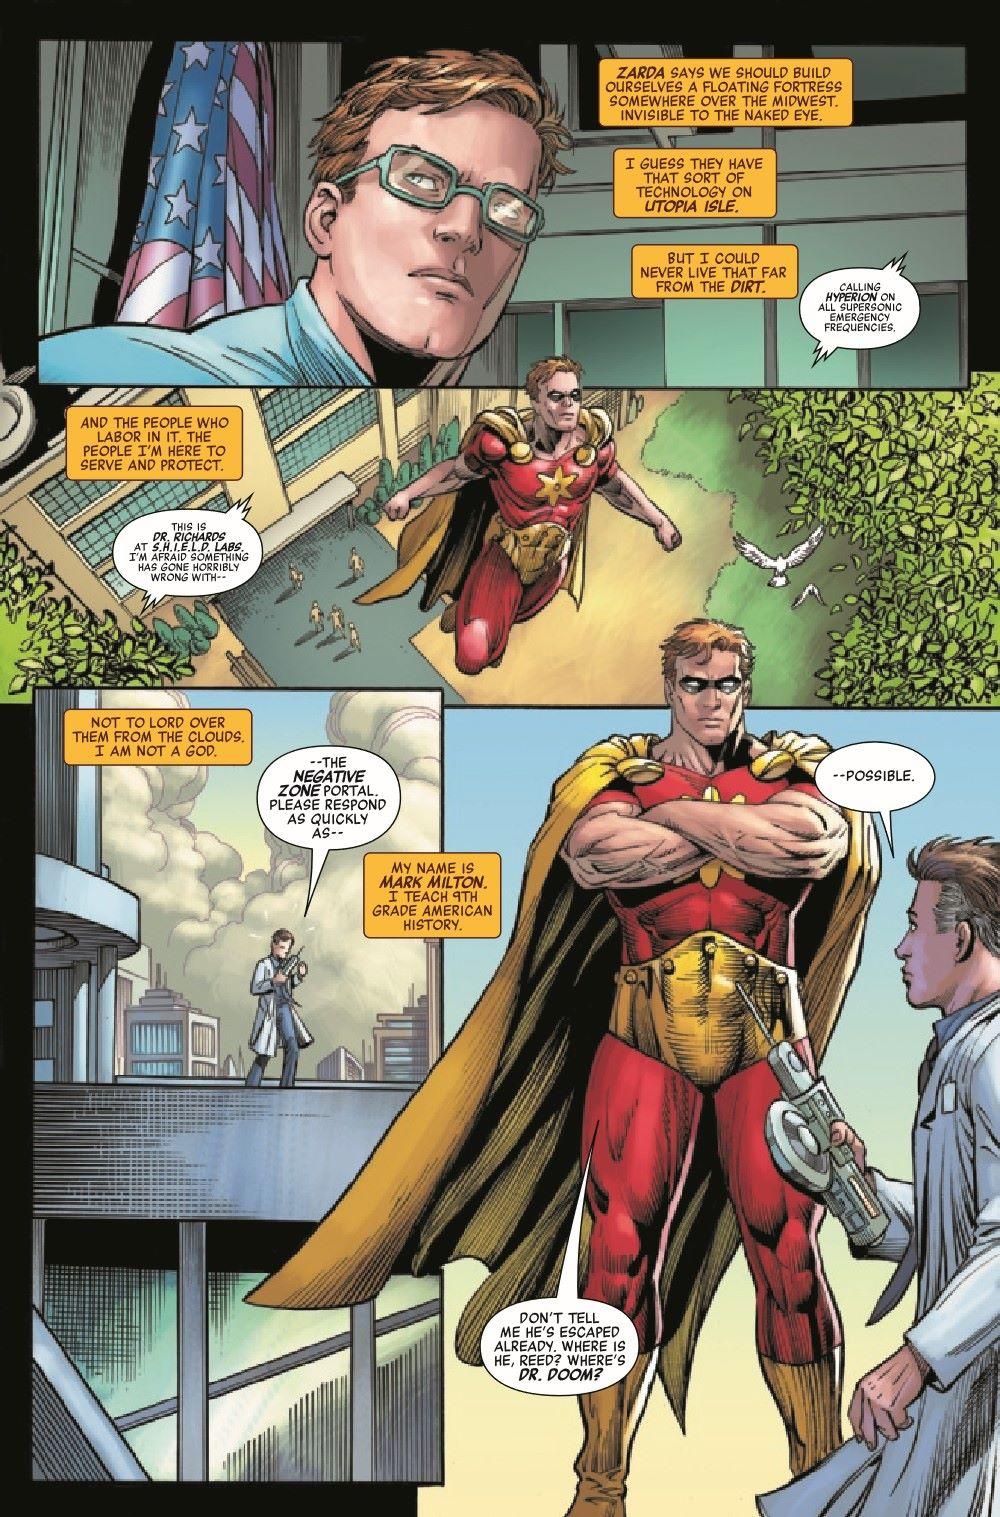 HEROESREBORN2021002_Preview-6 ComicList Previews: HEROES REBORN #2 (OF 7)